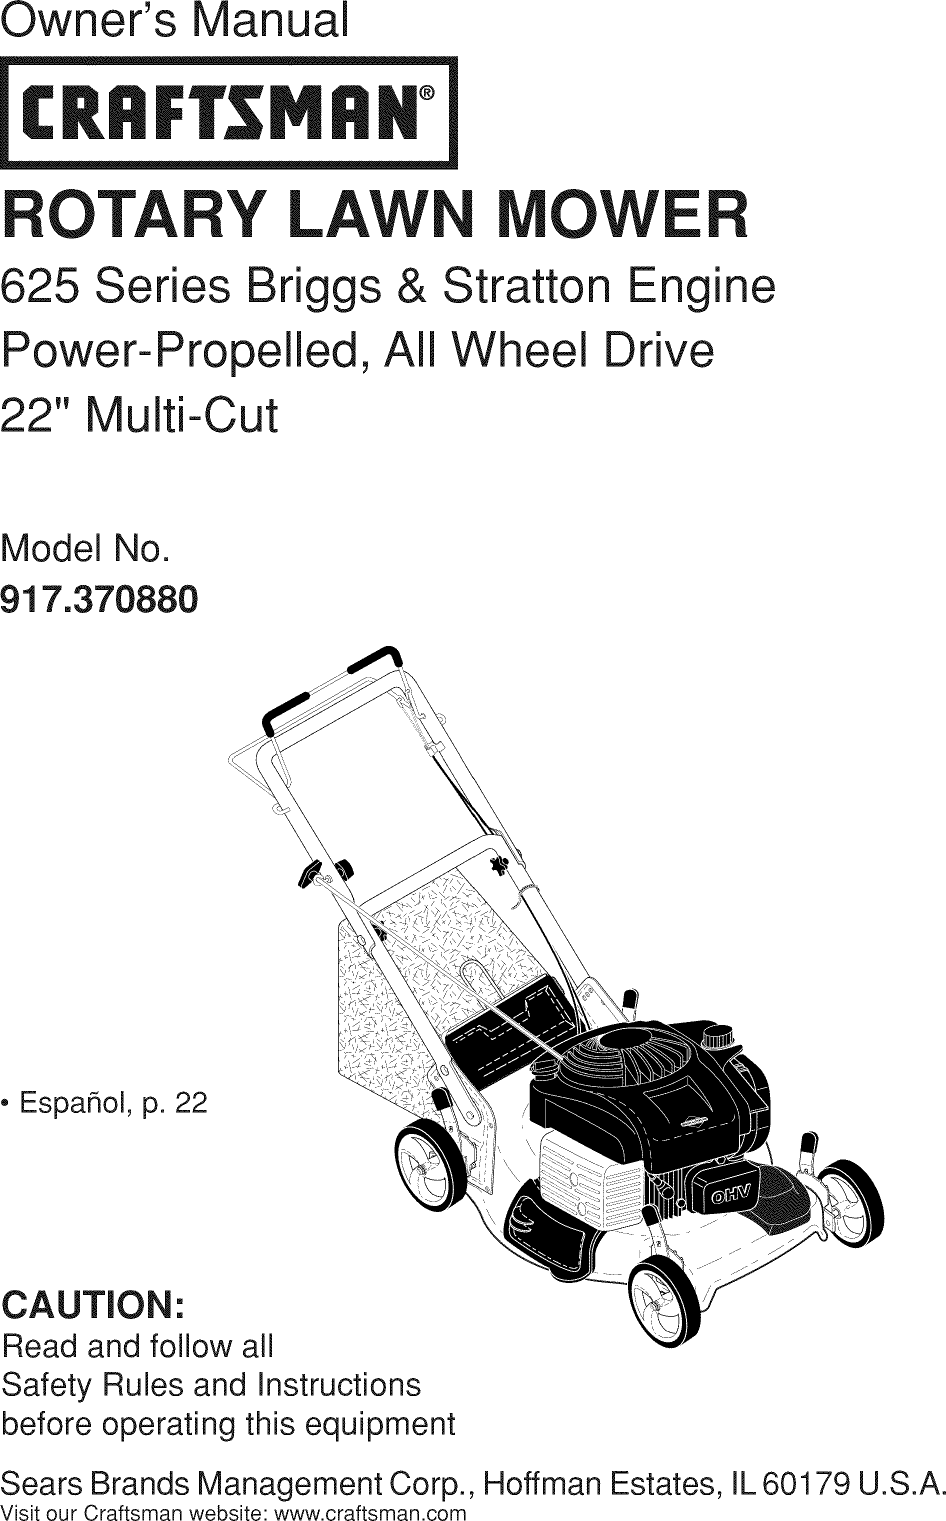 Craftsman 917370880 User Manual MOWER Manuals And Guides